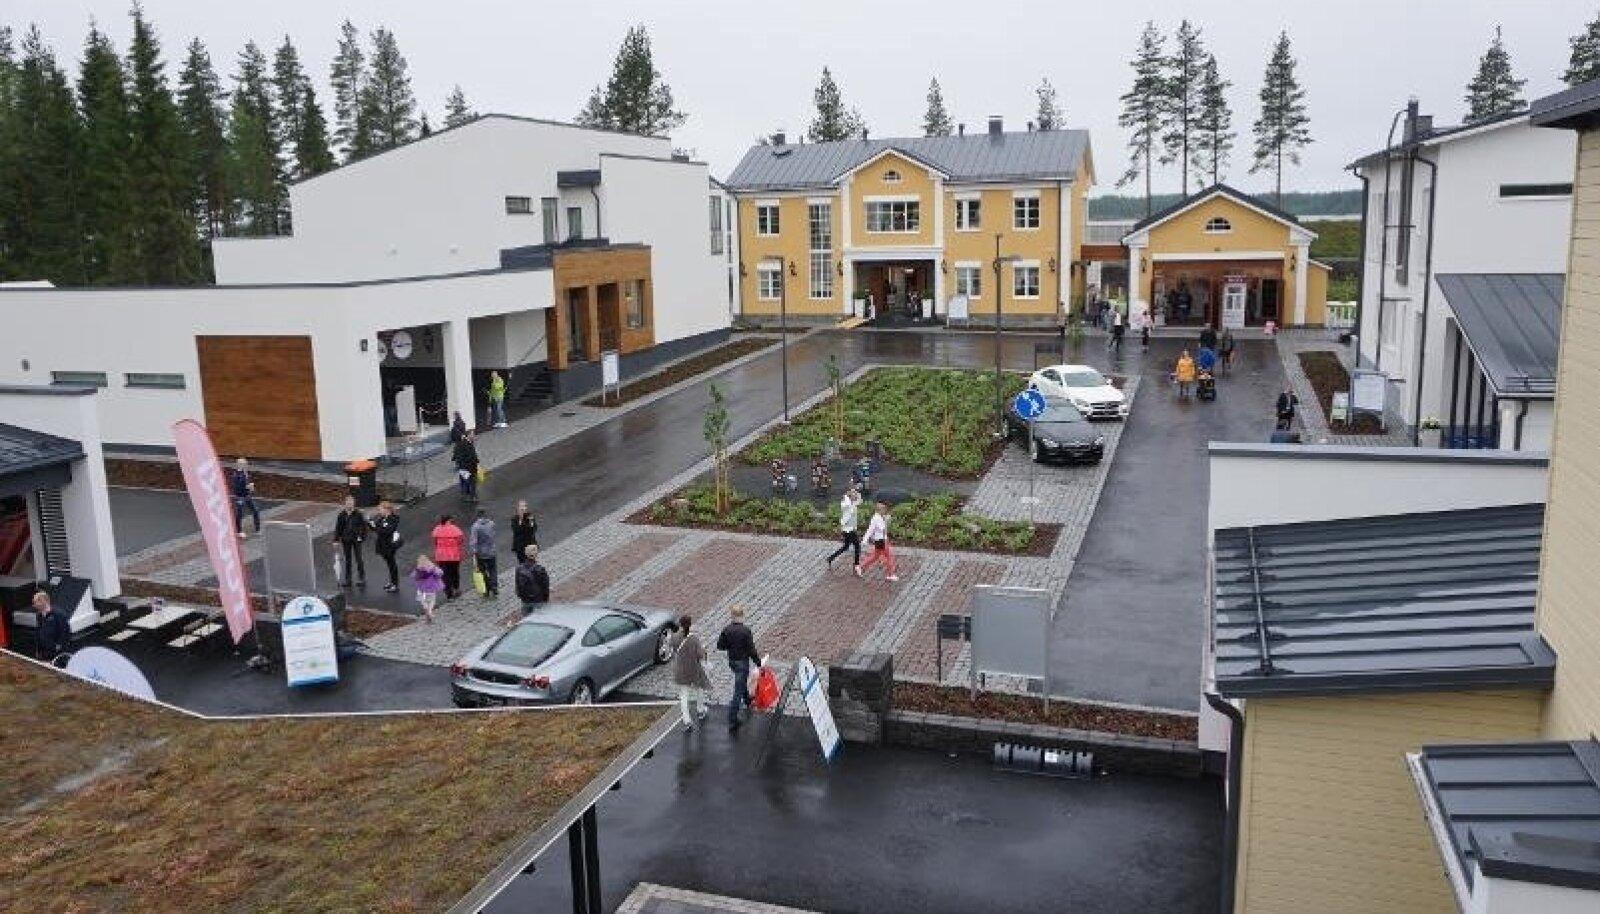 Soome elamumess